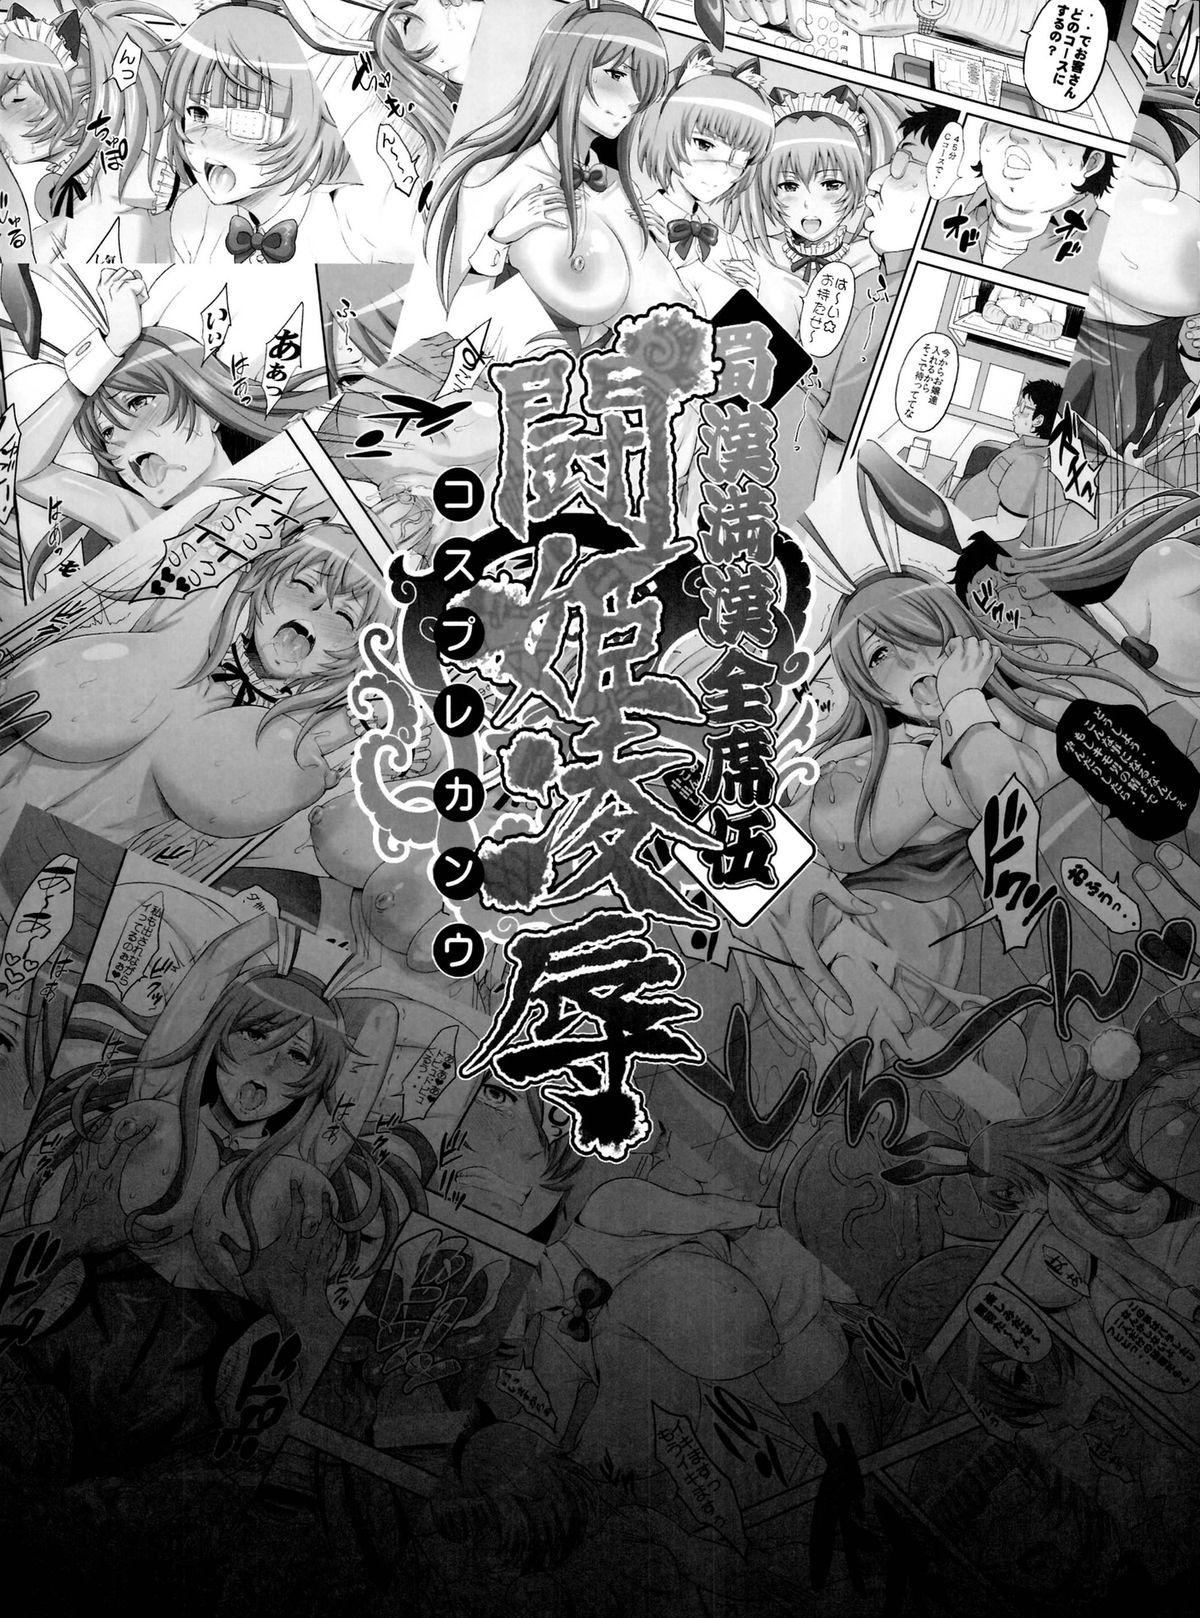 (C86) [Diogenes Club (Haikawa Hemlen)] Shokukan Mankan Zenseki Go Touki Ryoujoku   Shokukan Mankan Zenseki 5 - Princess Rape Battle- Cosplay Kanu (Ikkitousen) [English] {doujin-moe.us} 22